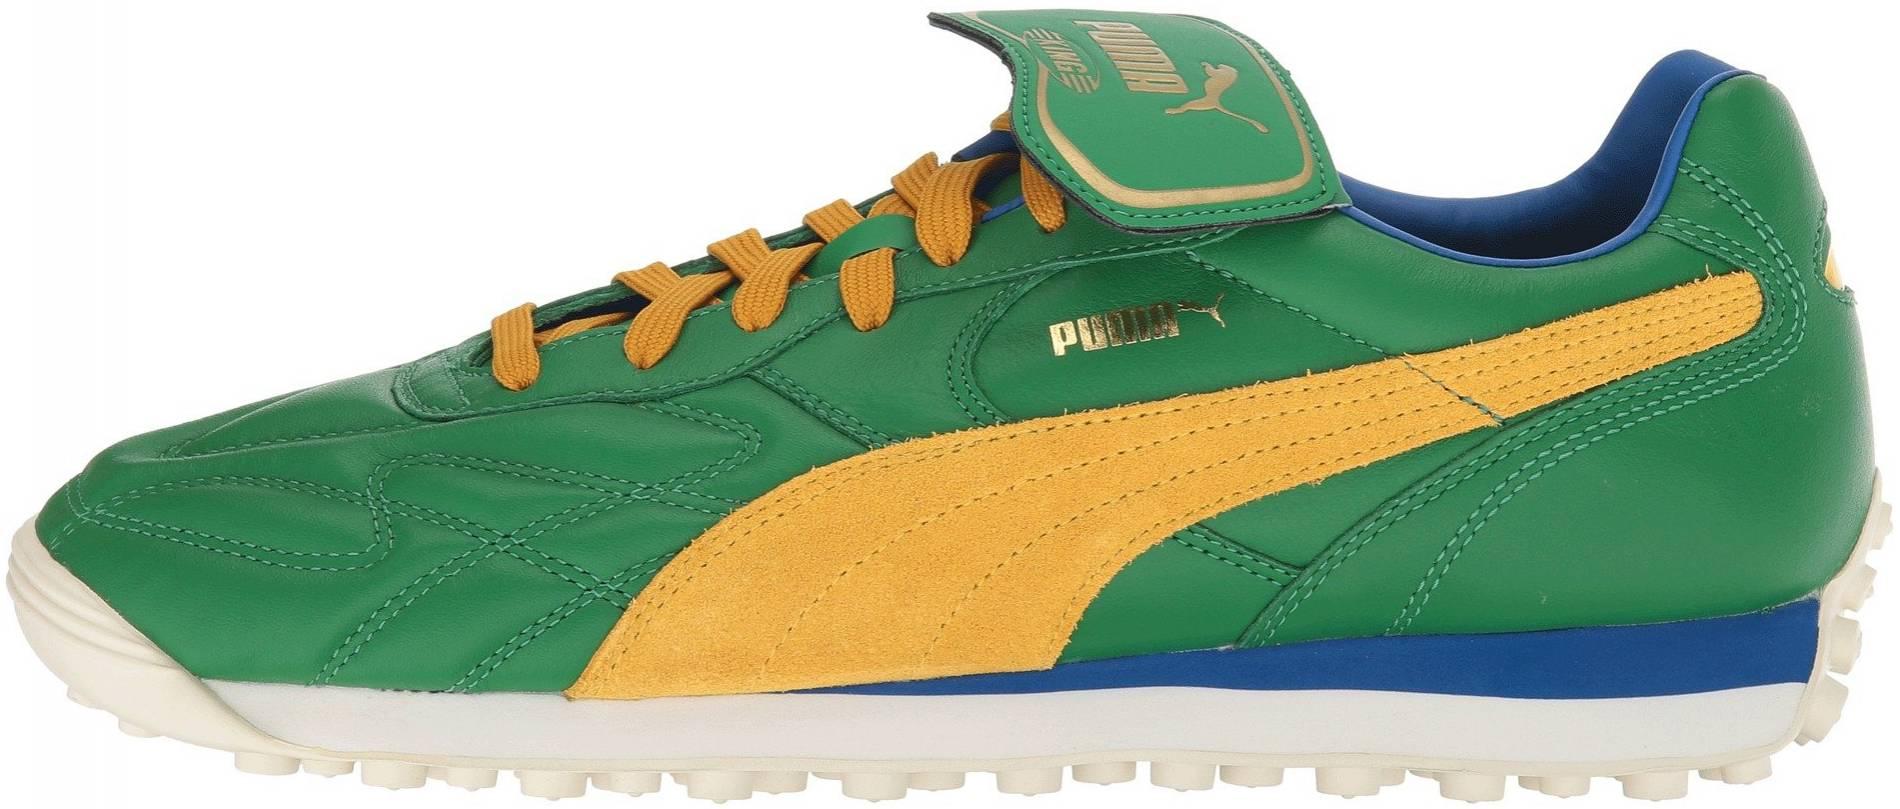 caja registradora teoría Búsqueda  8 Reasons to/NOT to Buy Puma King Avanti Legends Pack (Feb 2021) | RunRepeat